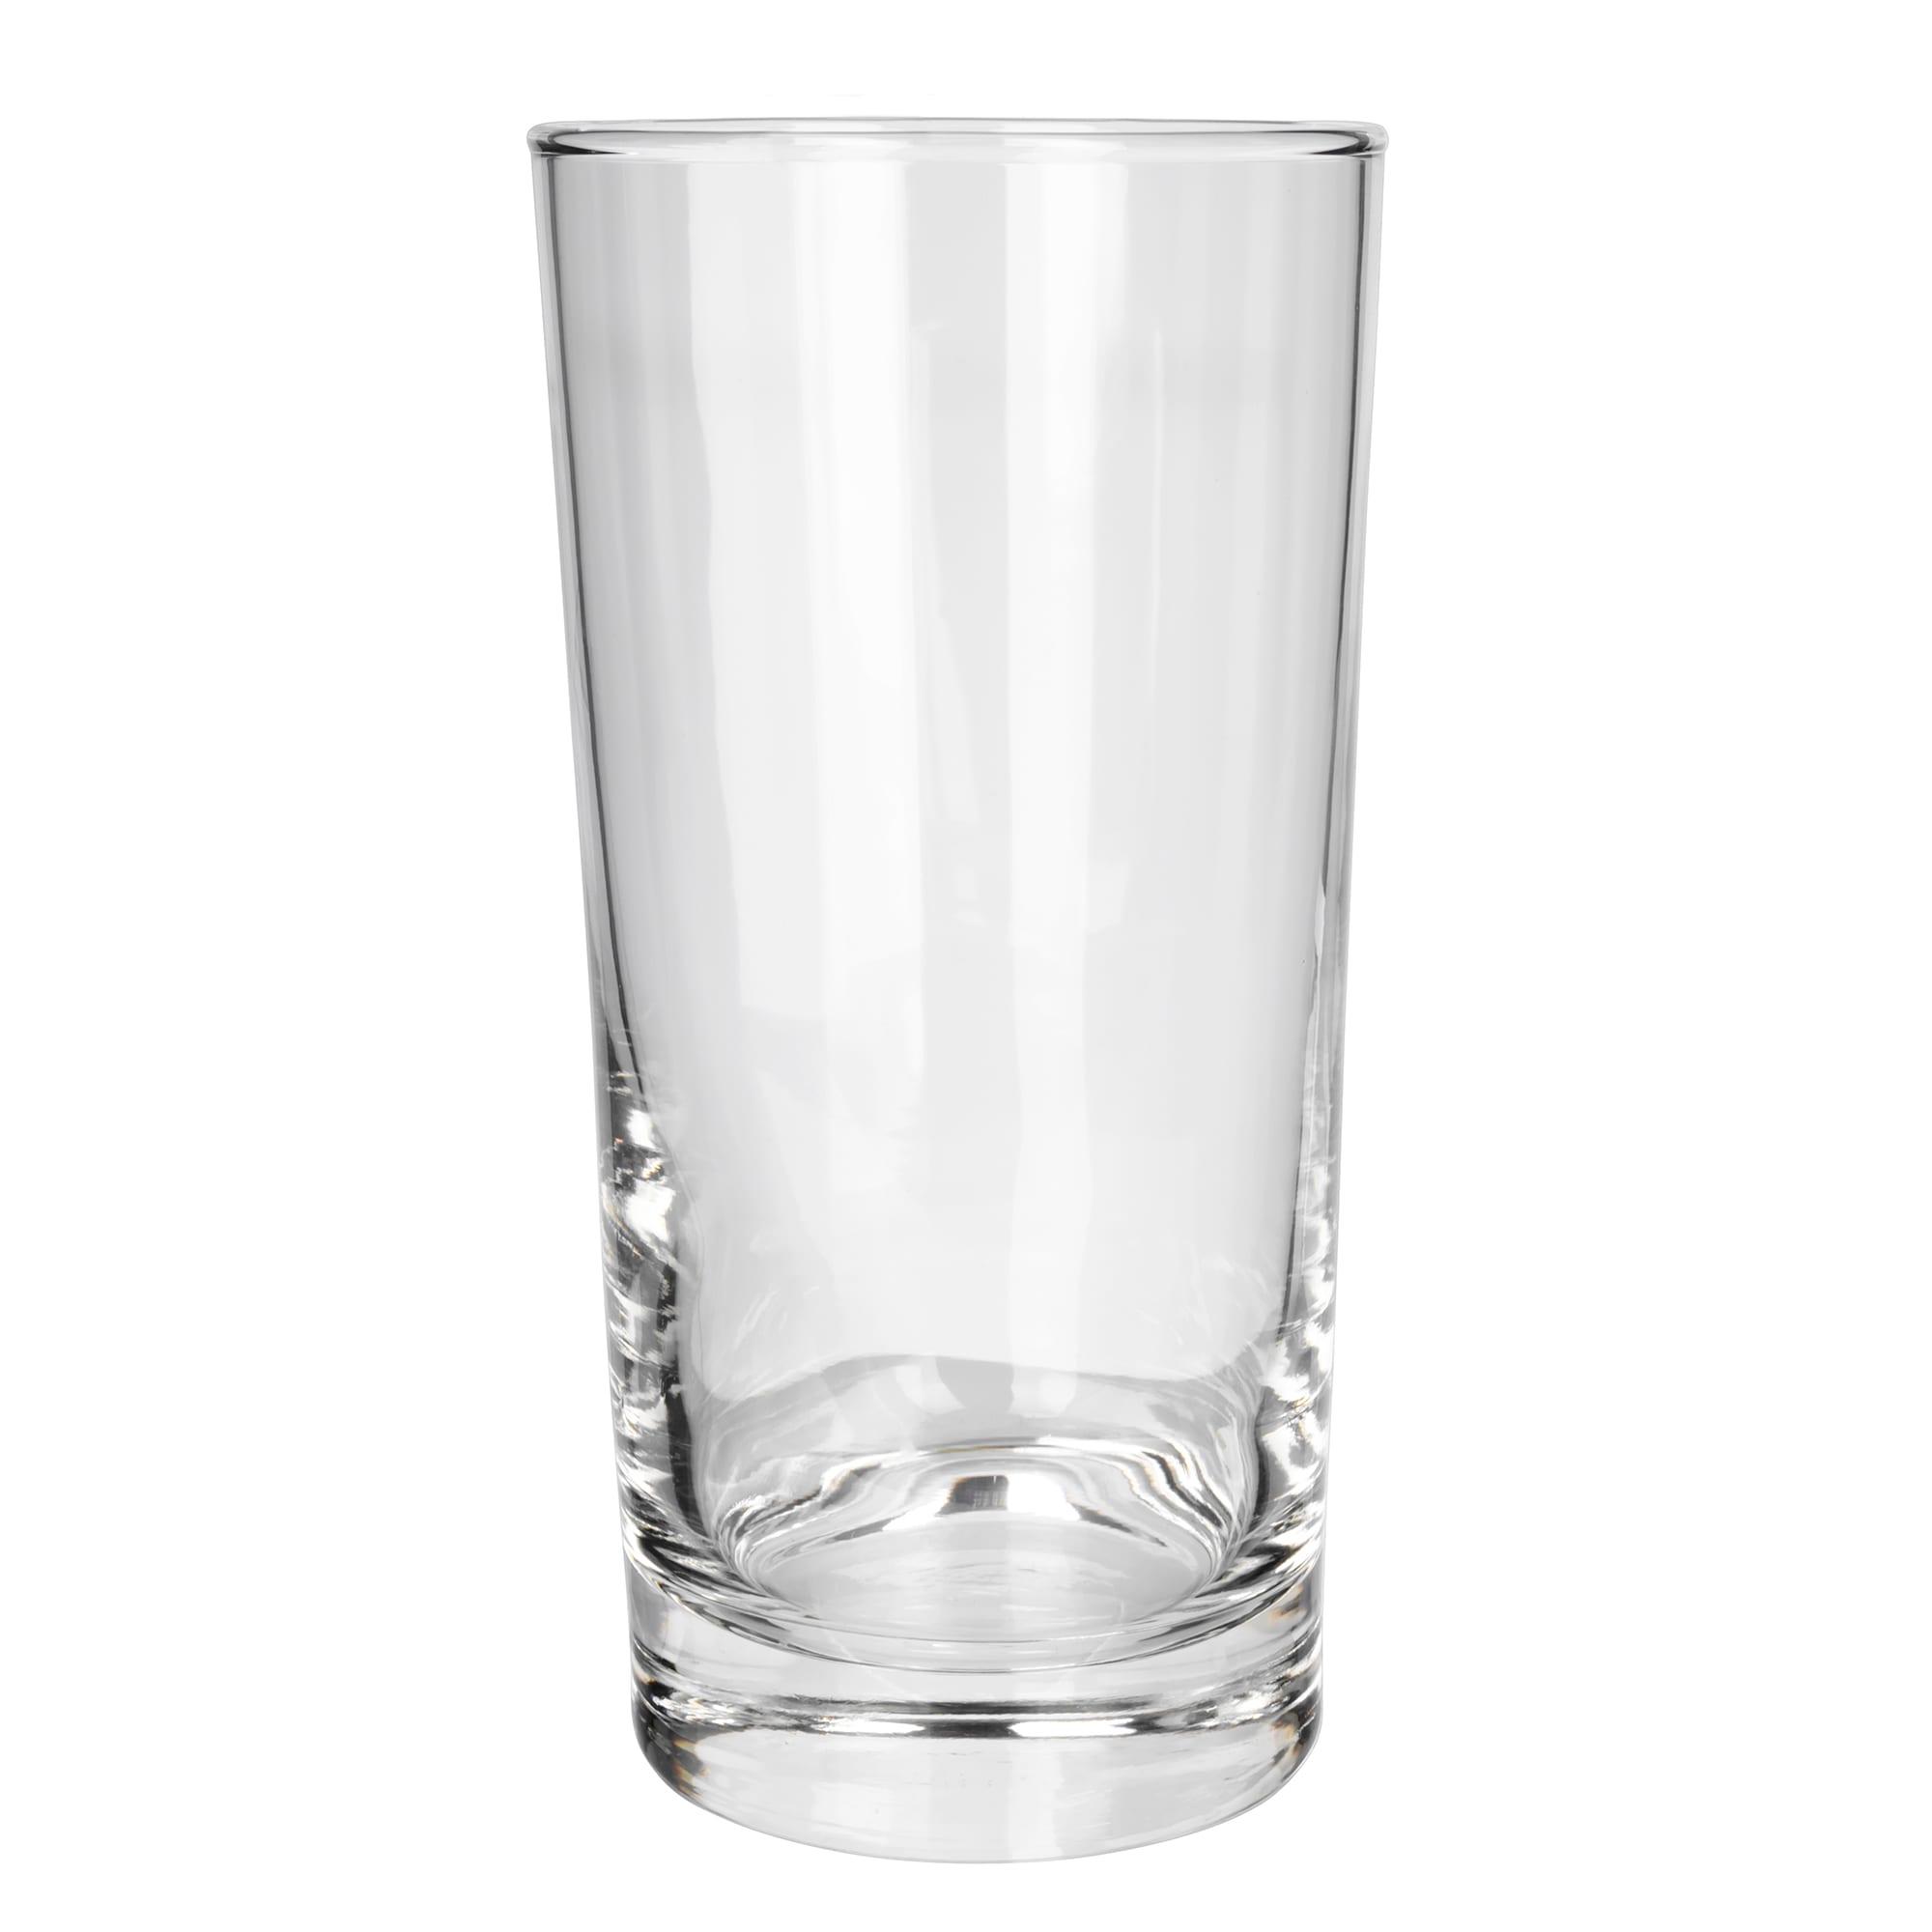 Libbey 159 12.5-oz Heavy Base Beverage Glass - Safedge Rim Guarantee